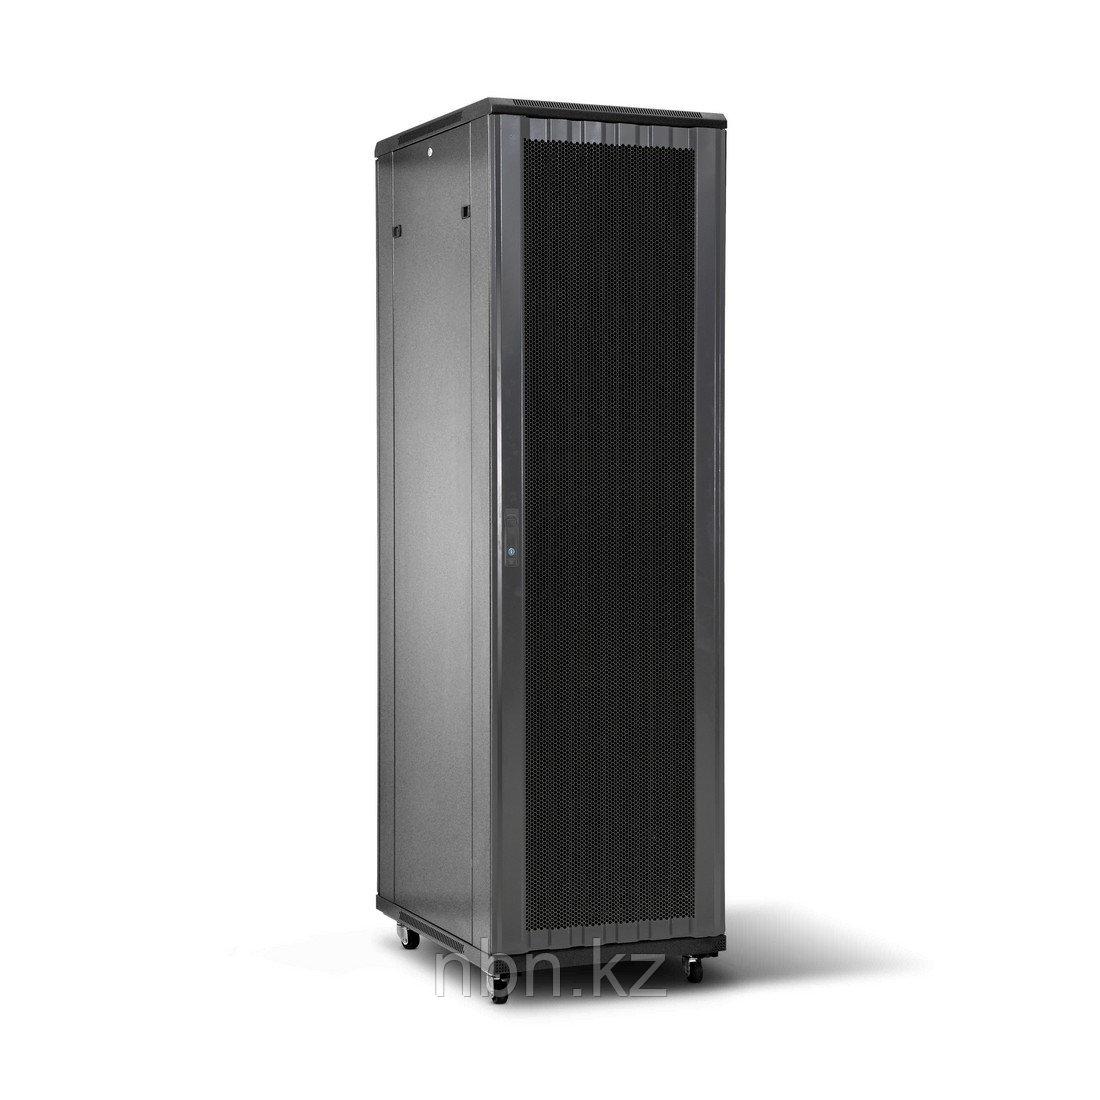 Шкаф серверный SHIP 601S.6824.54.100 24U 600*800*1200 мм